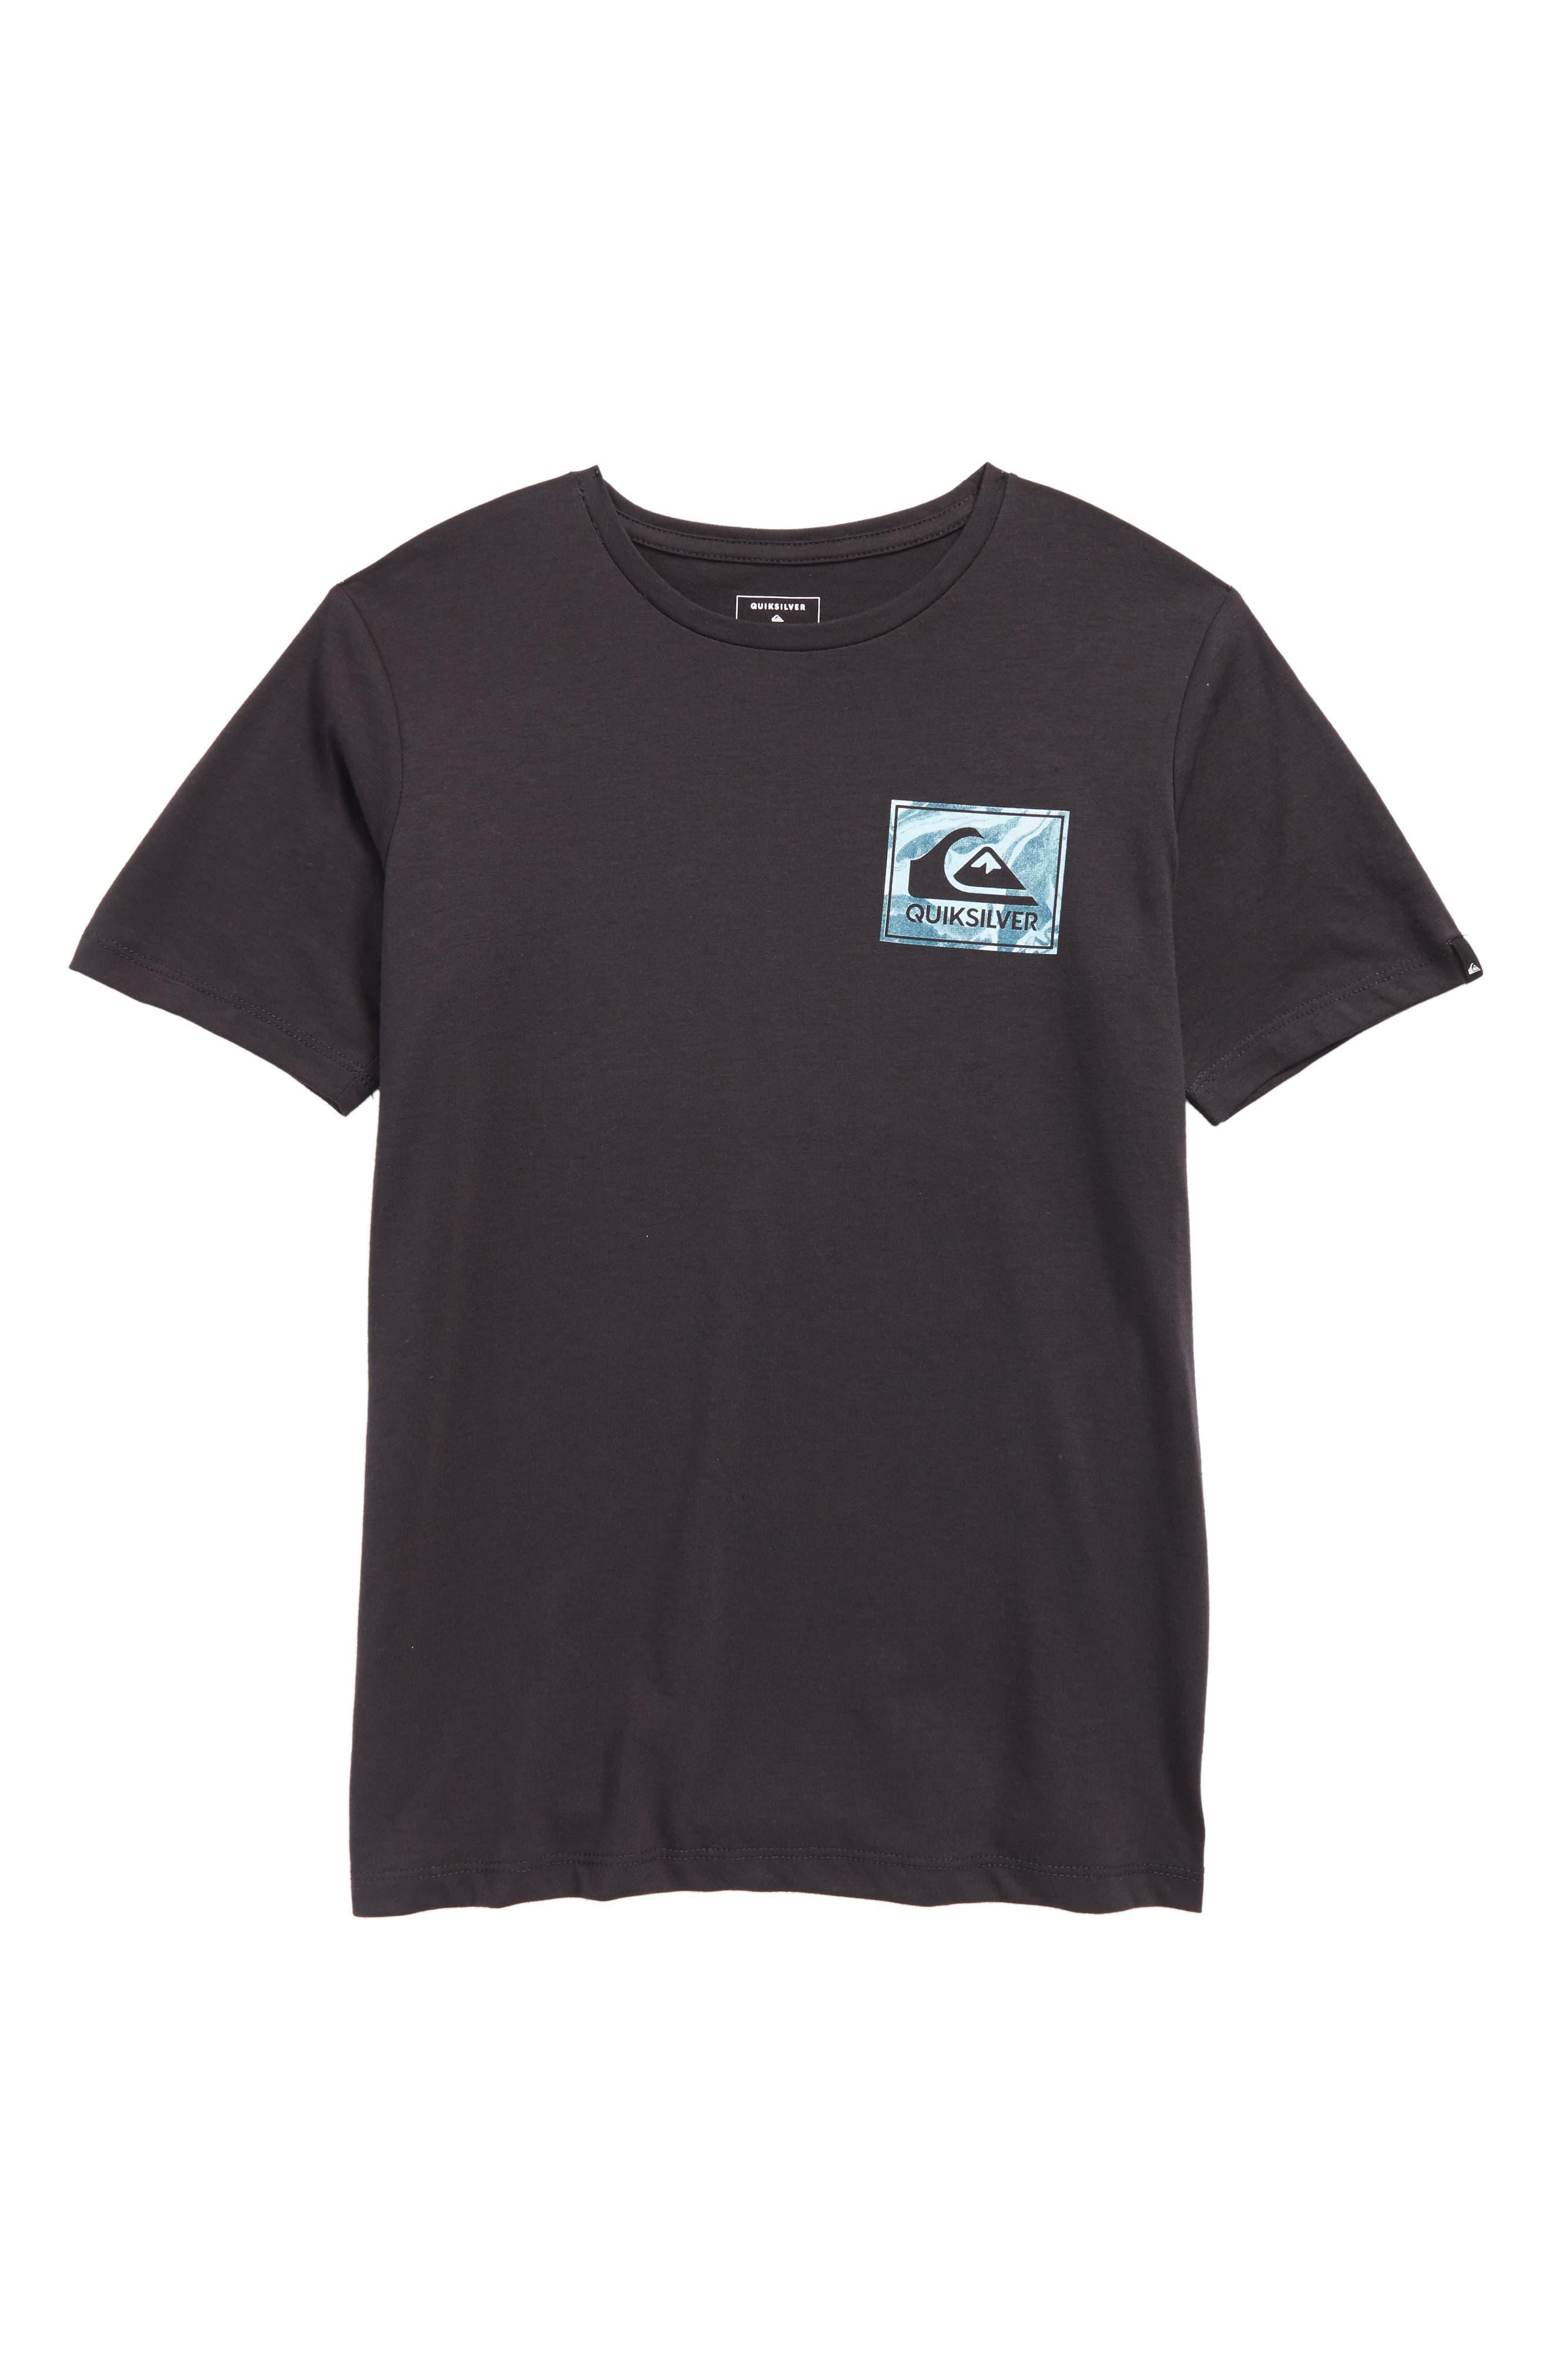 QUIKSILVER,                             Volcano Blues T-Shirt,                             Main thumbnail 1, color,                             005